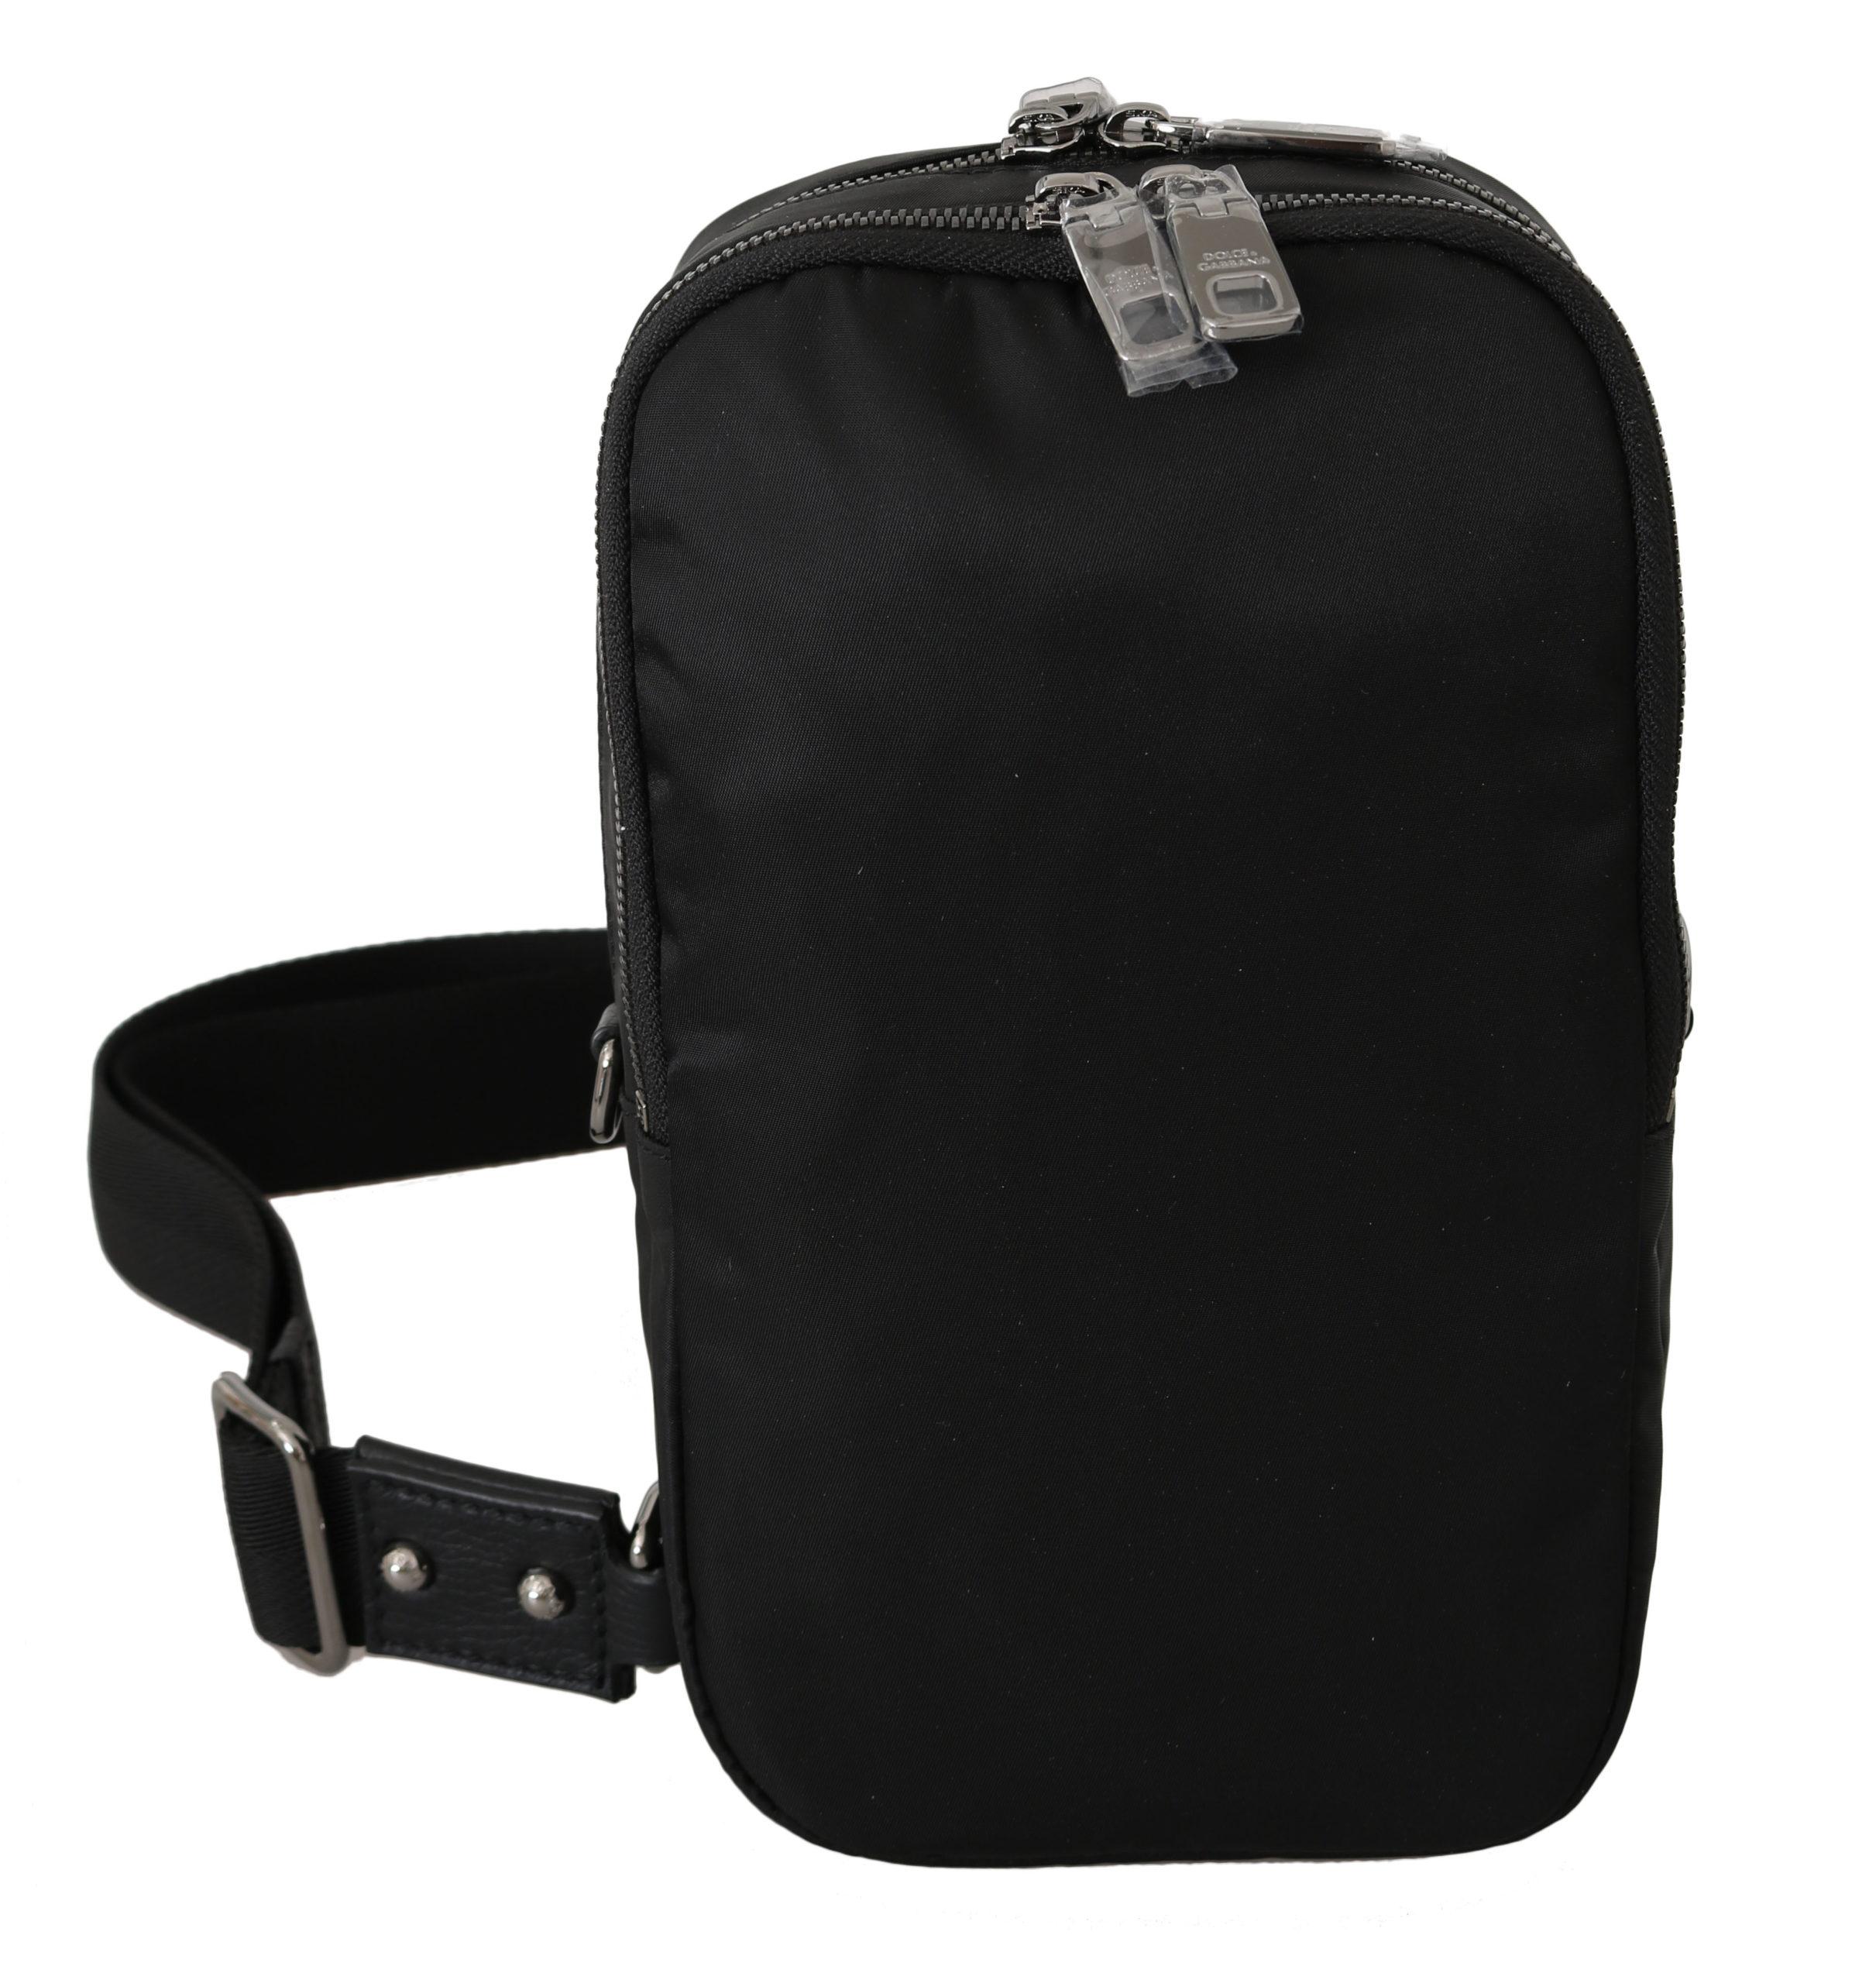 Dolce & Gabbana Men's Nylon Strap Crossbody Bag Black VAS8768